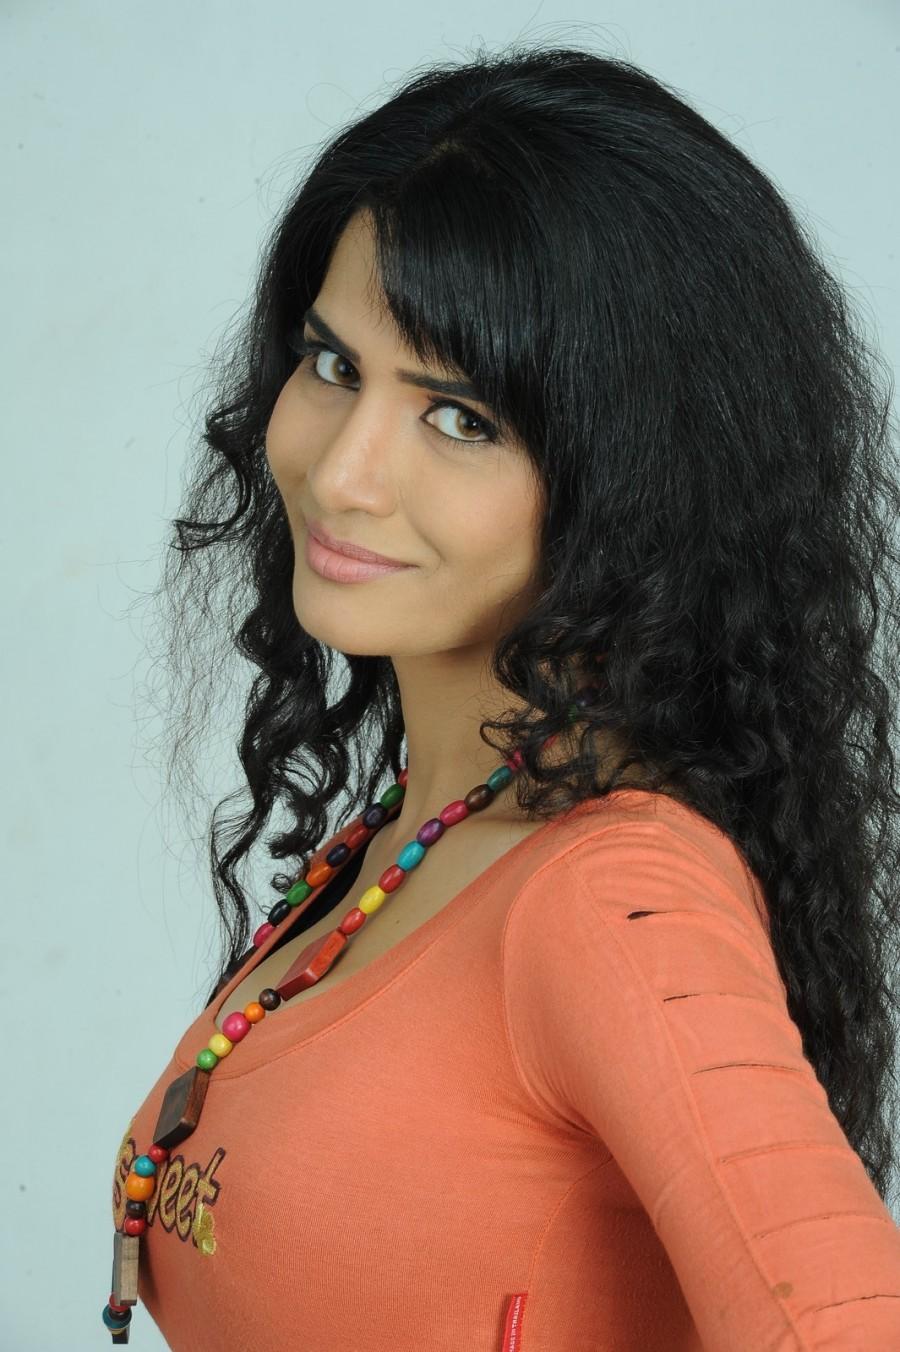 Love boom,telugu movie,love boom photos,love boom stills,nagesh naradaasi,Bharath bhushan,Milan,Ritu,Chacha Patumtip